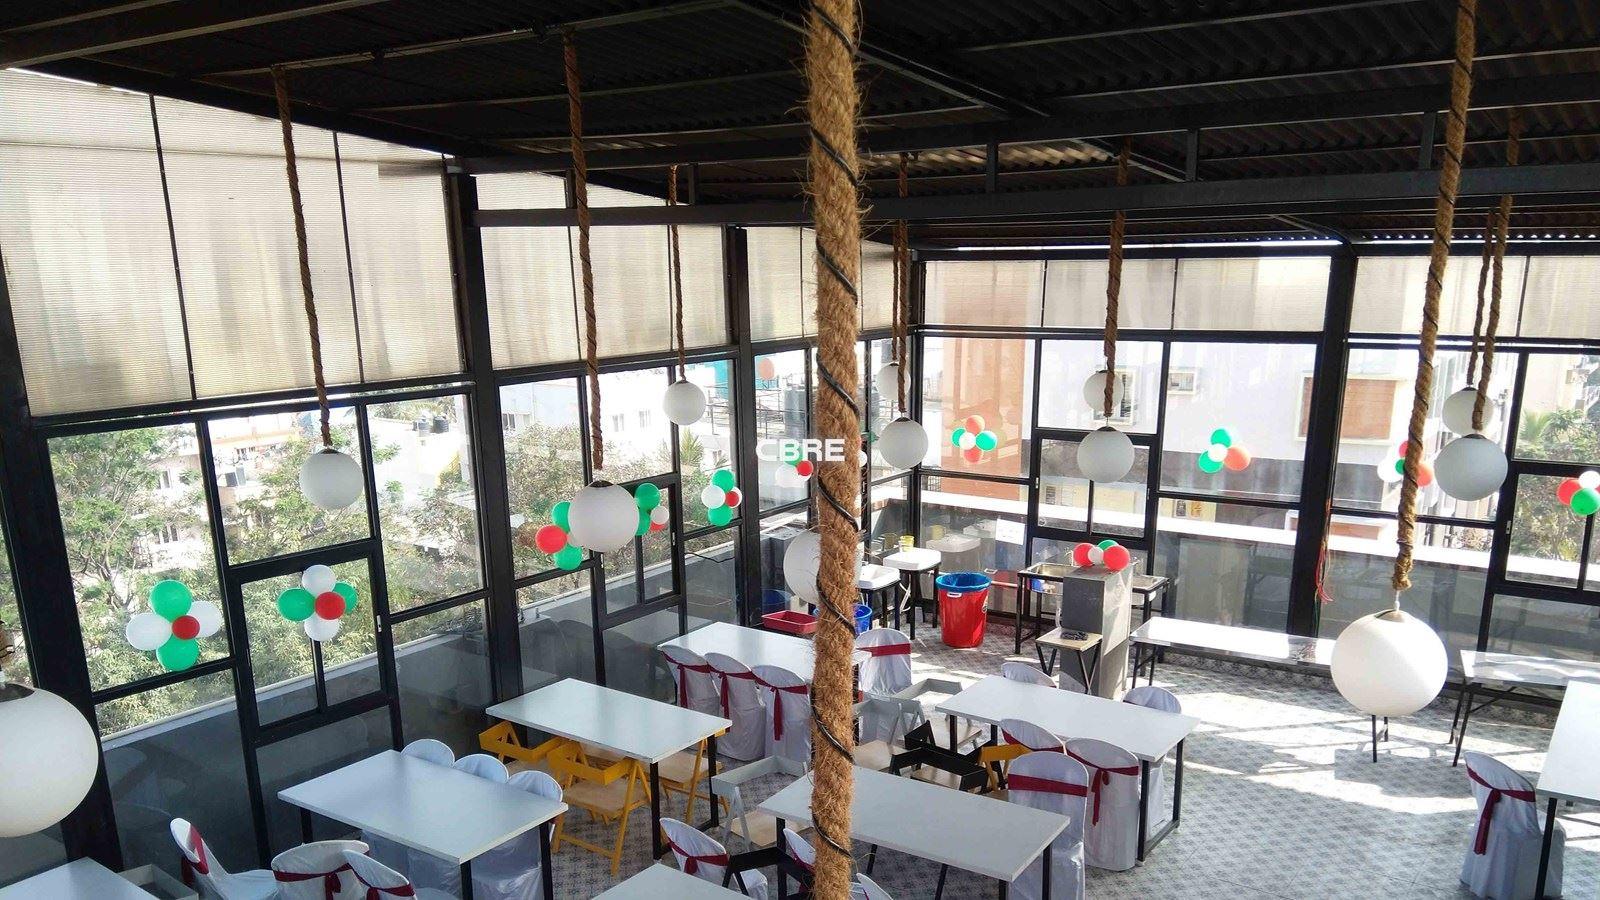 Flexible Office To Rent Hustelhub H205 Iti Layout Sector 7 Hsr Layout Bengaluru Karnataka India 560102 Cbre Commercial